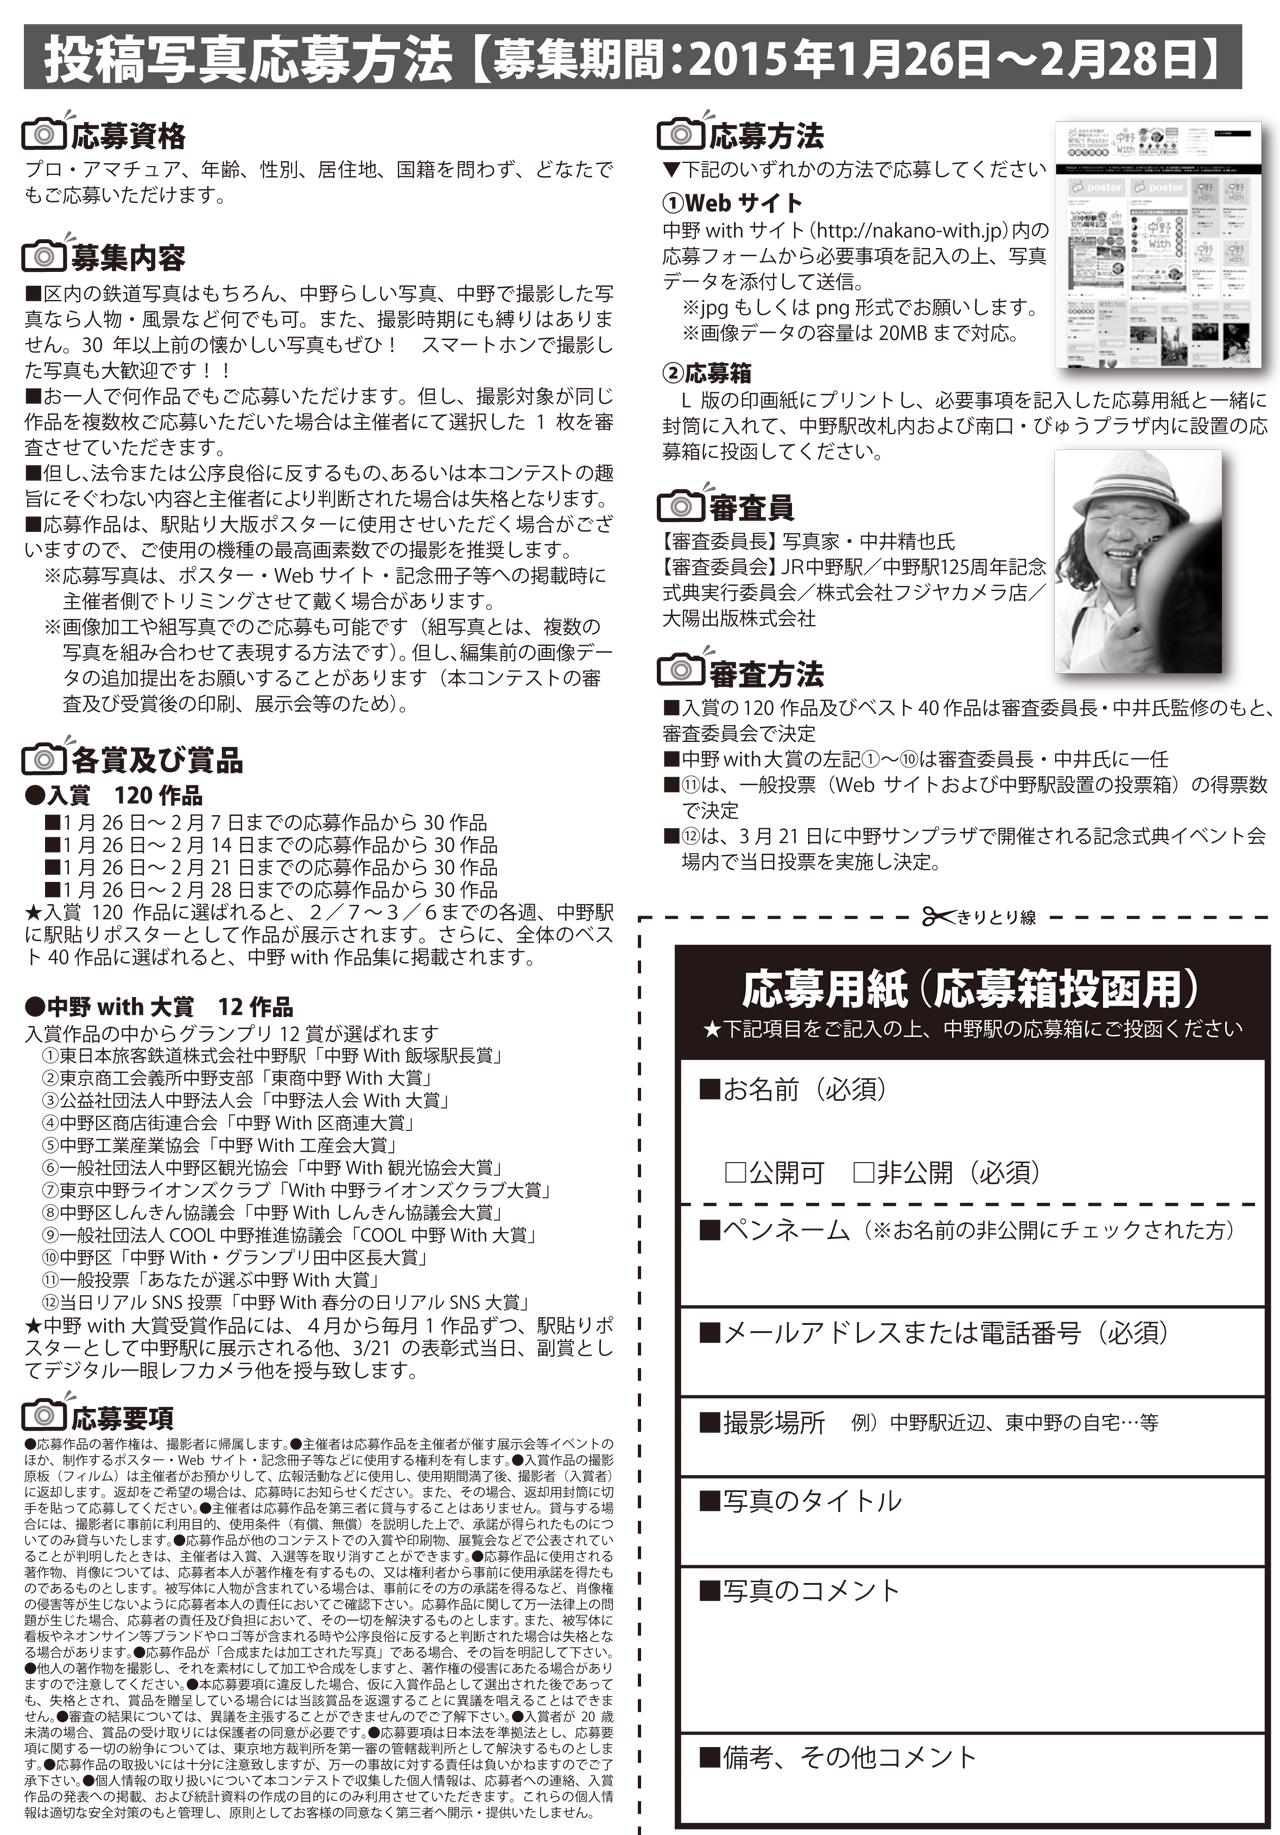 application _form